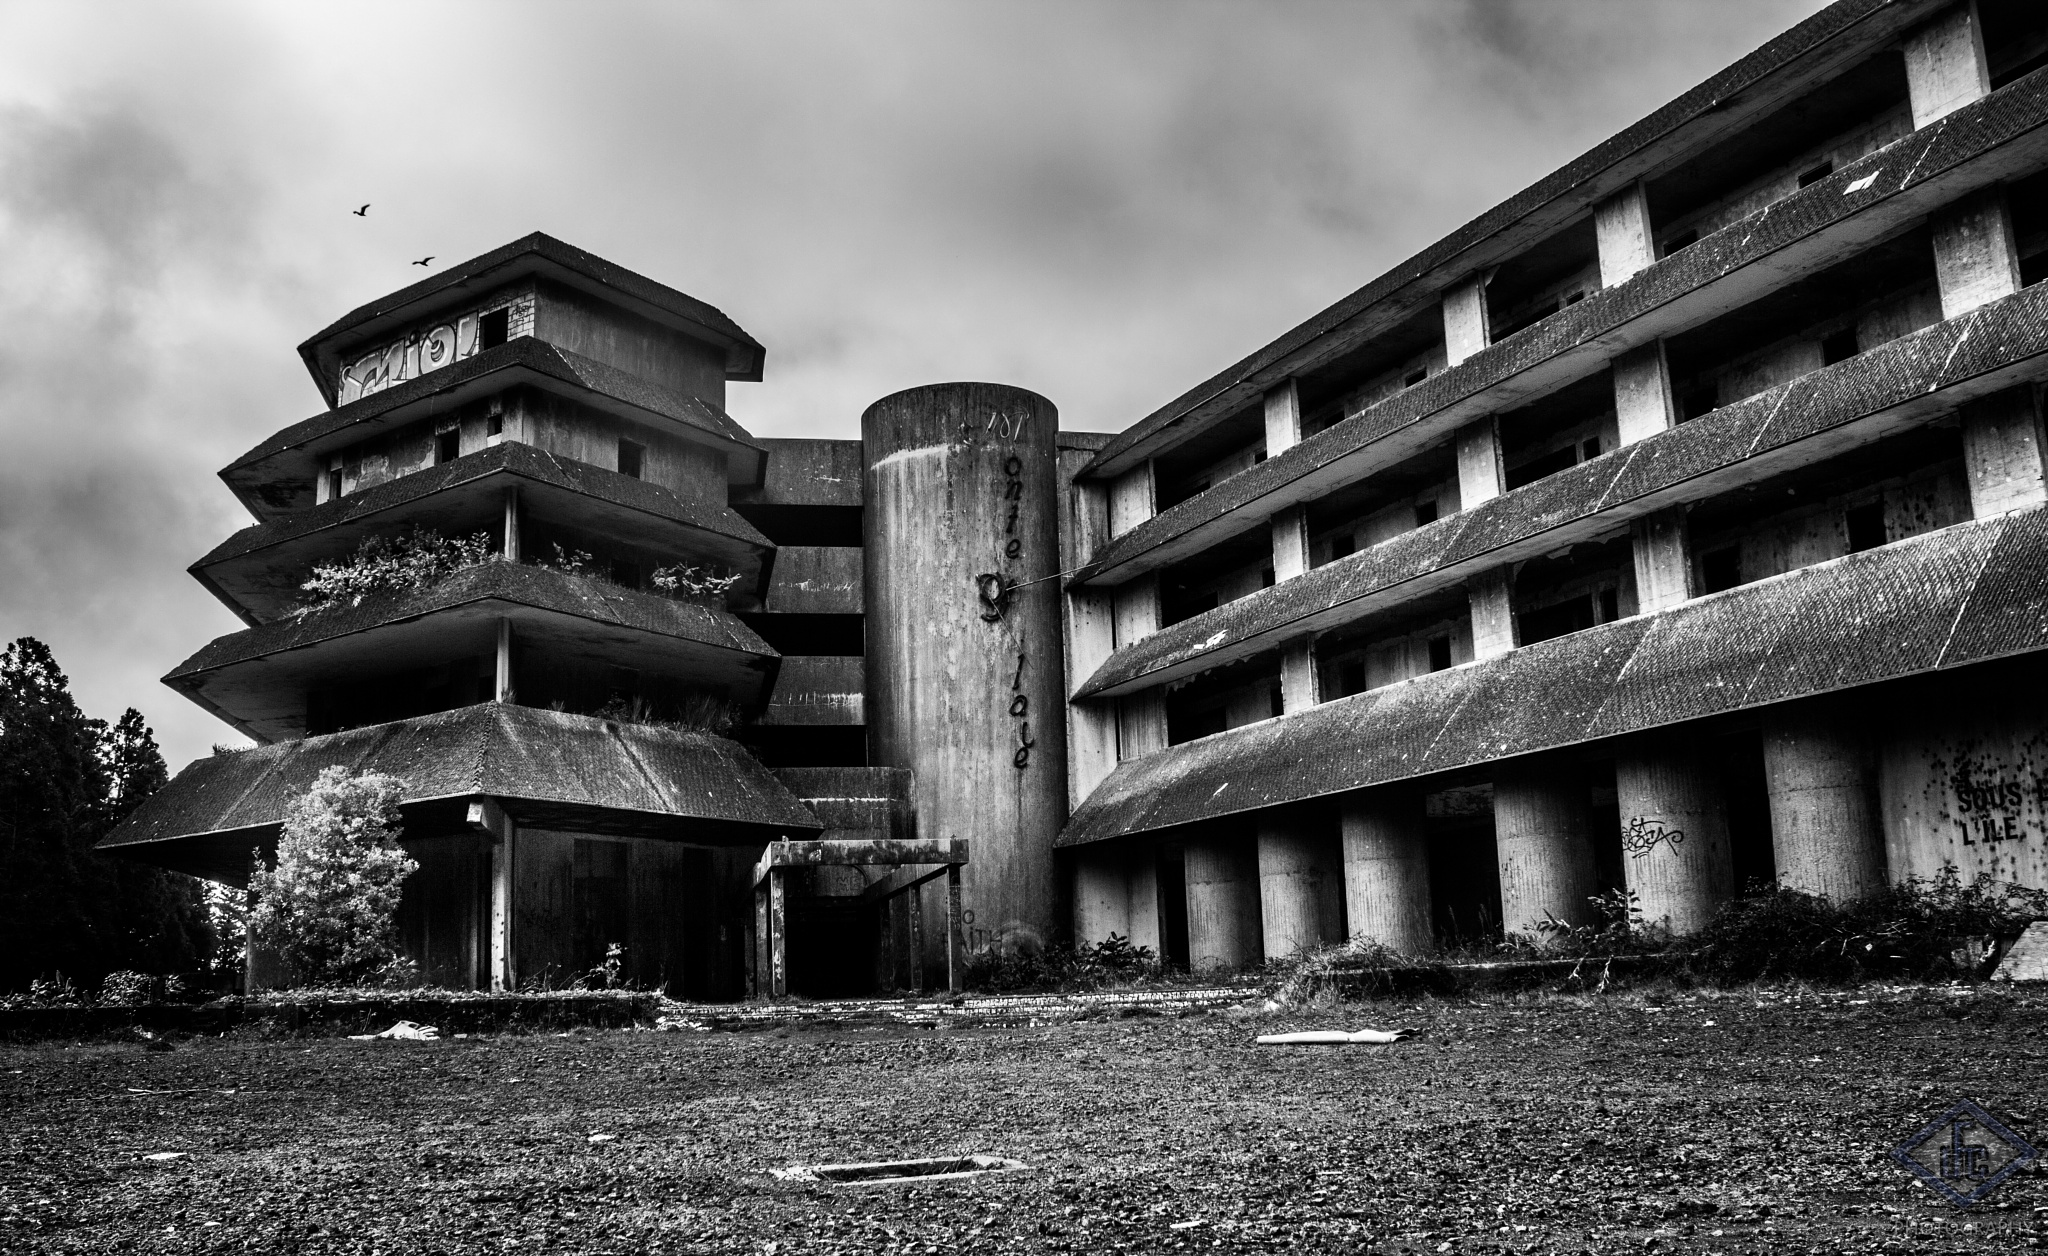 Lost Hotel by LuisFilipeCorreia